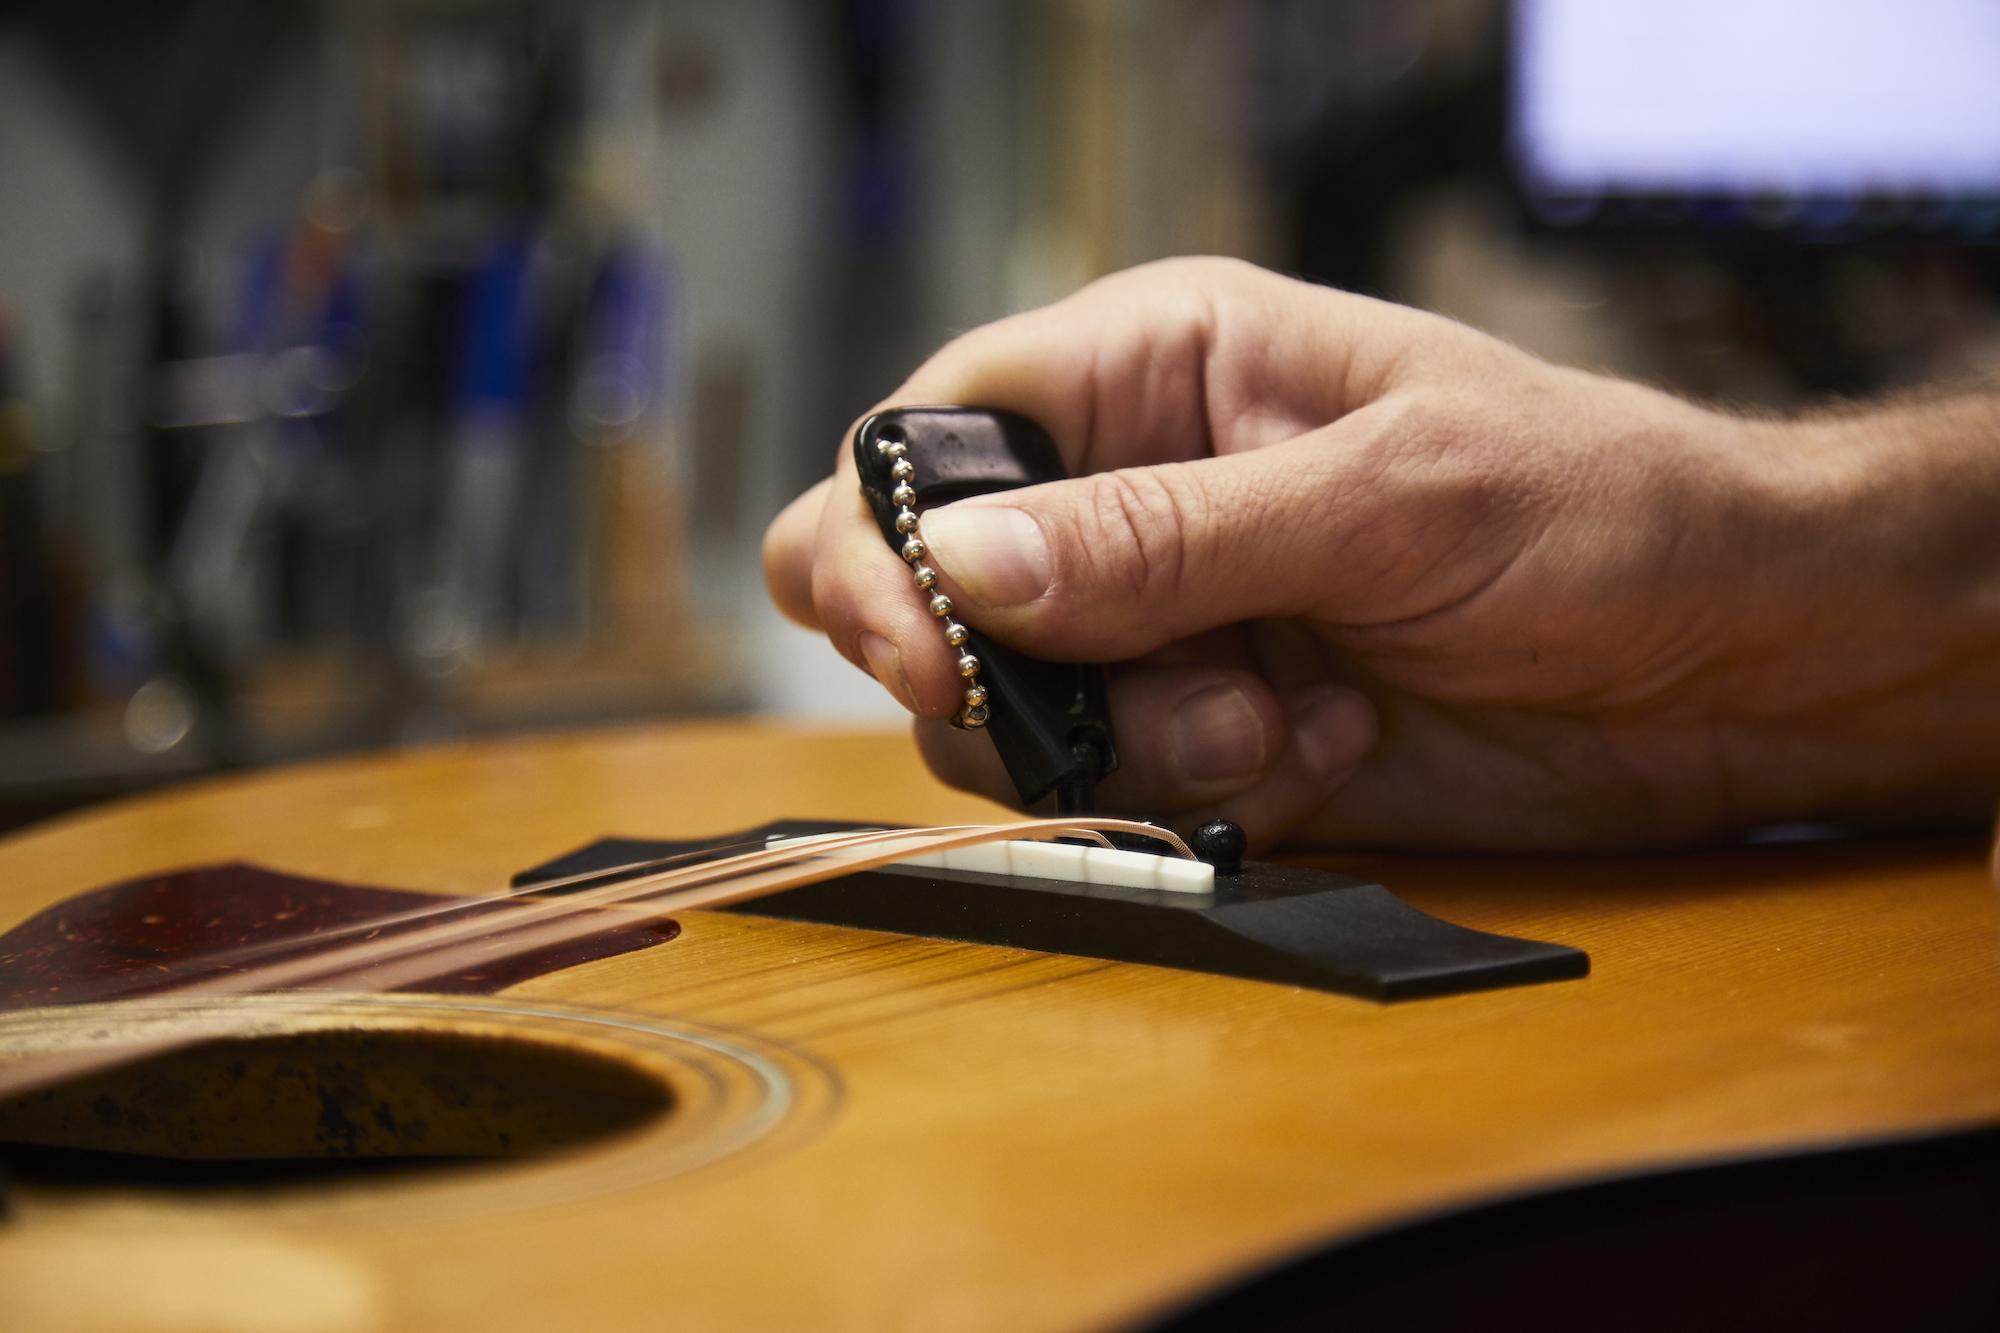 Taylor-BeatieWolfe-Guitar-_I2A8796 copy.jpg